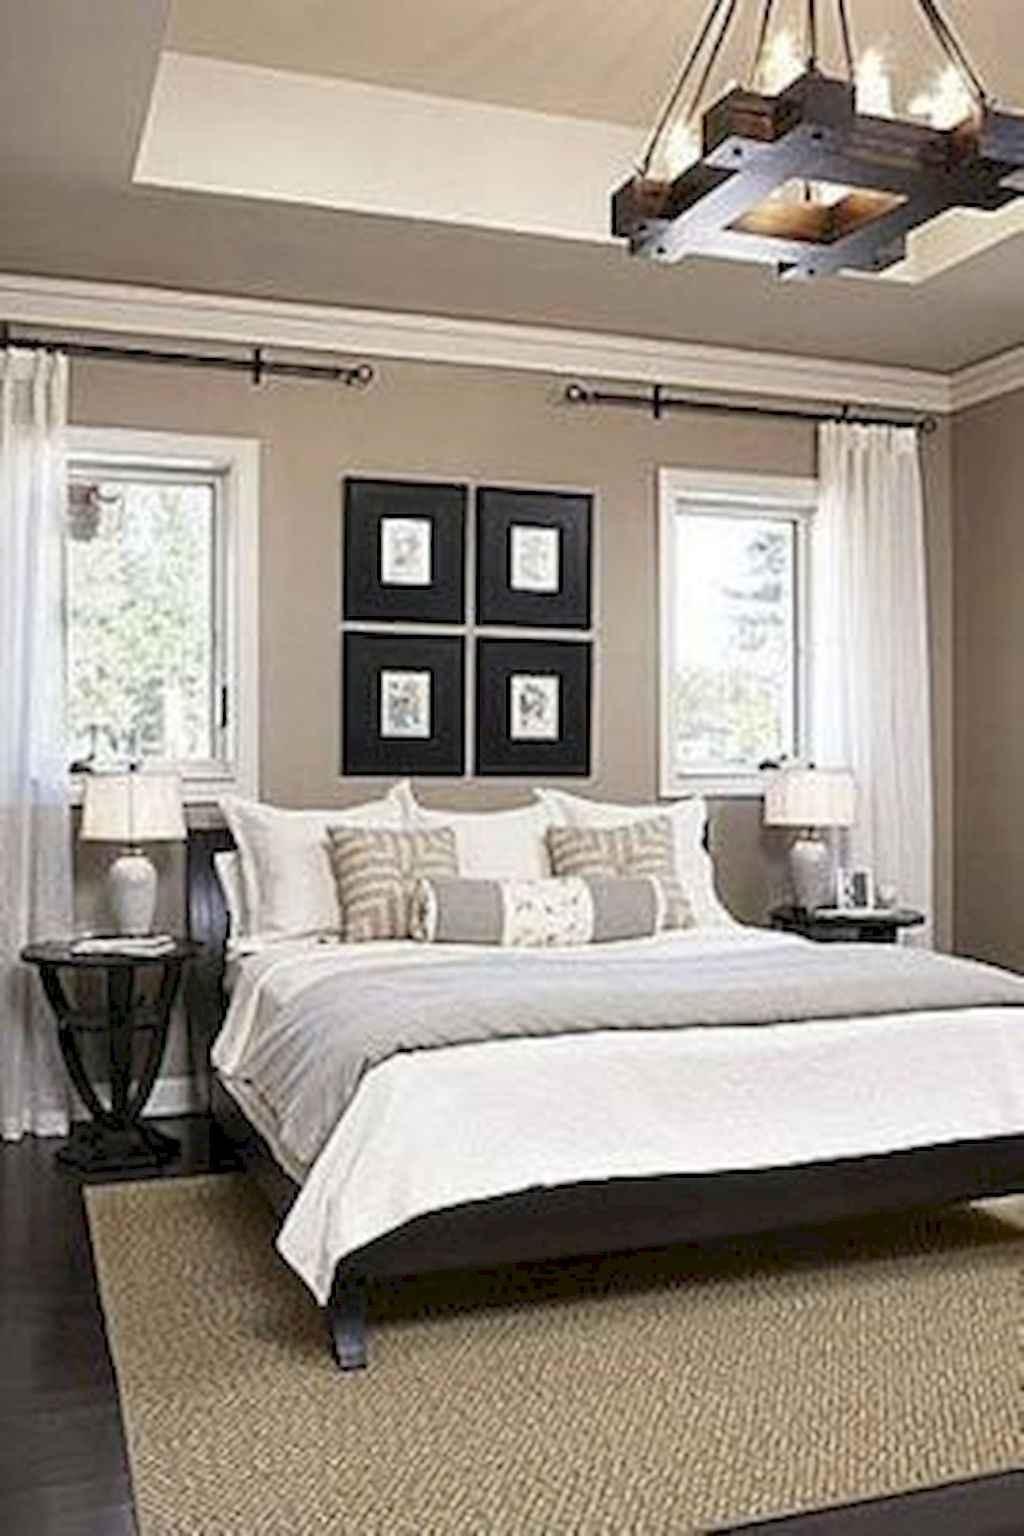 Incredible master bedroom ideas (29)